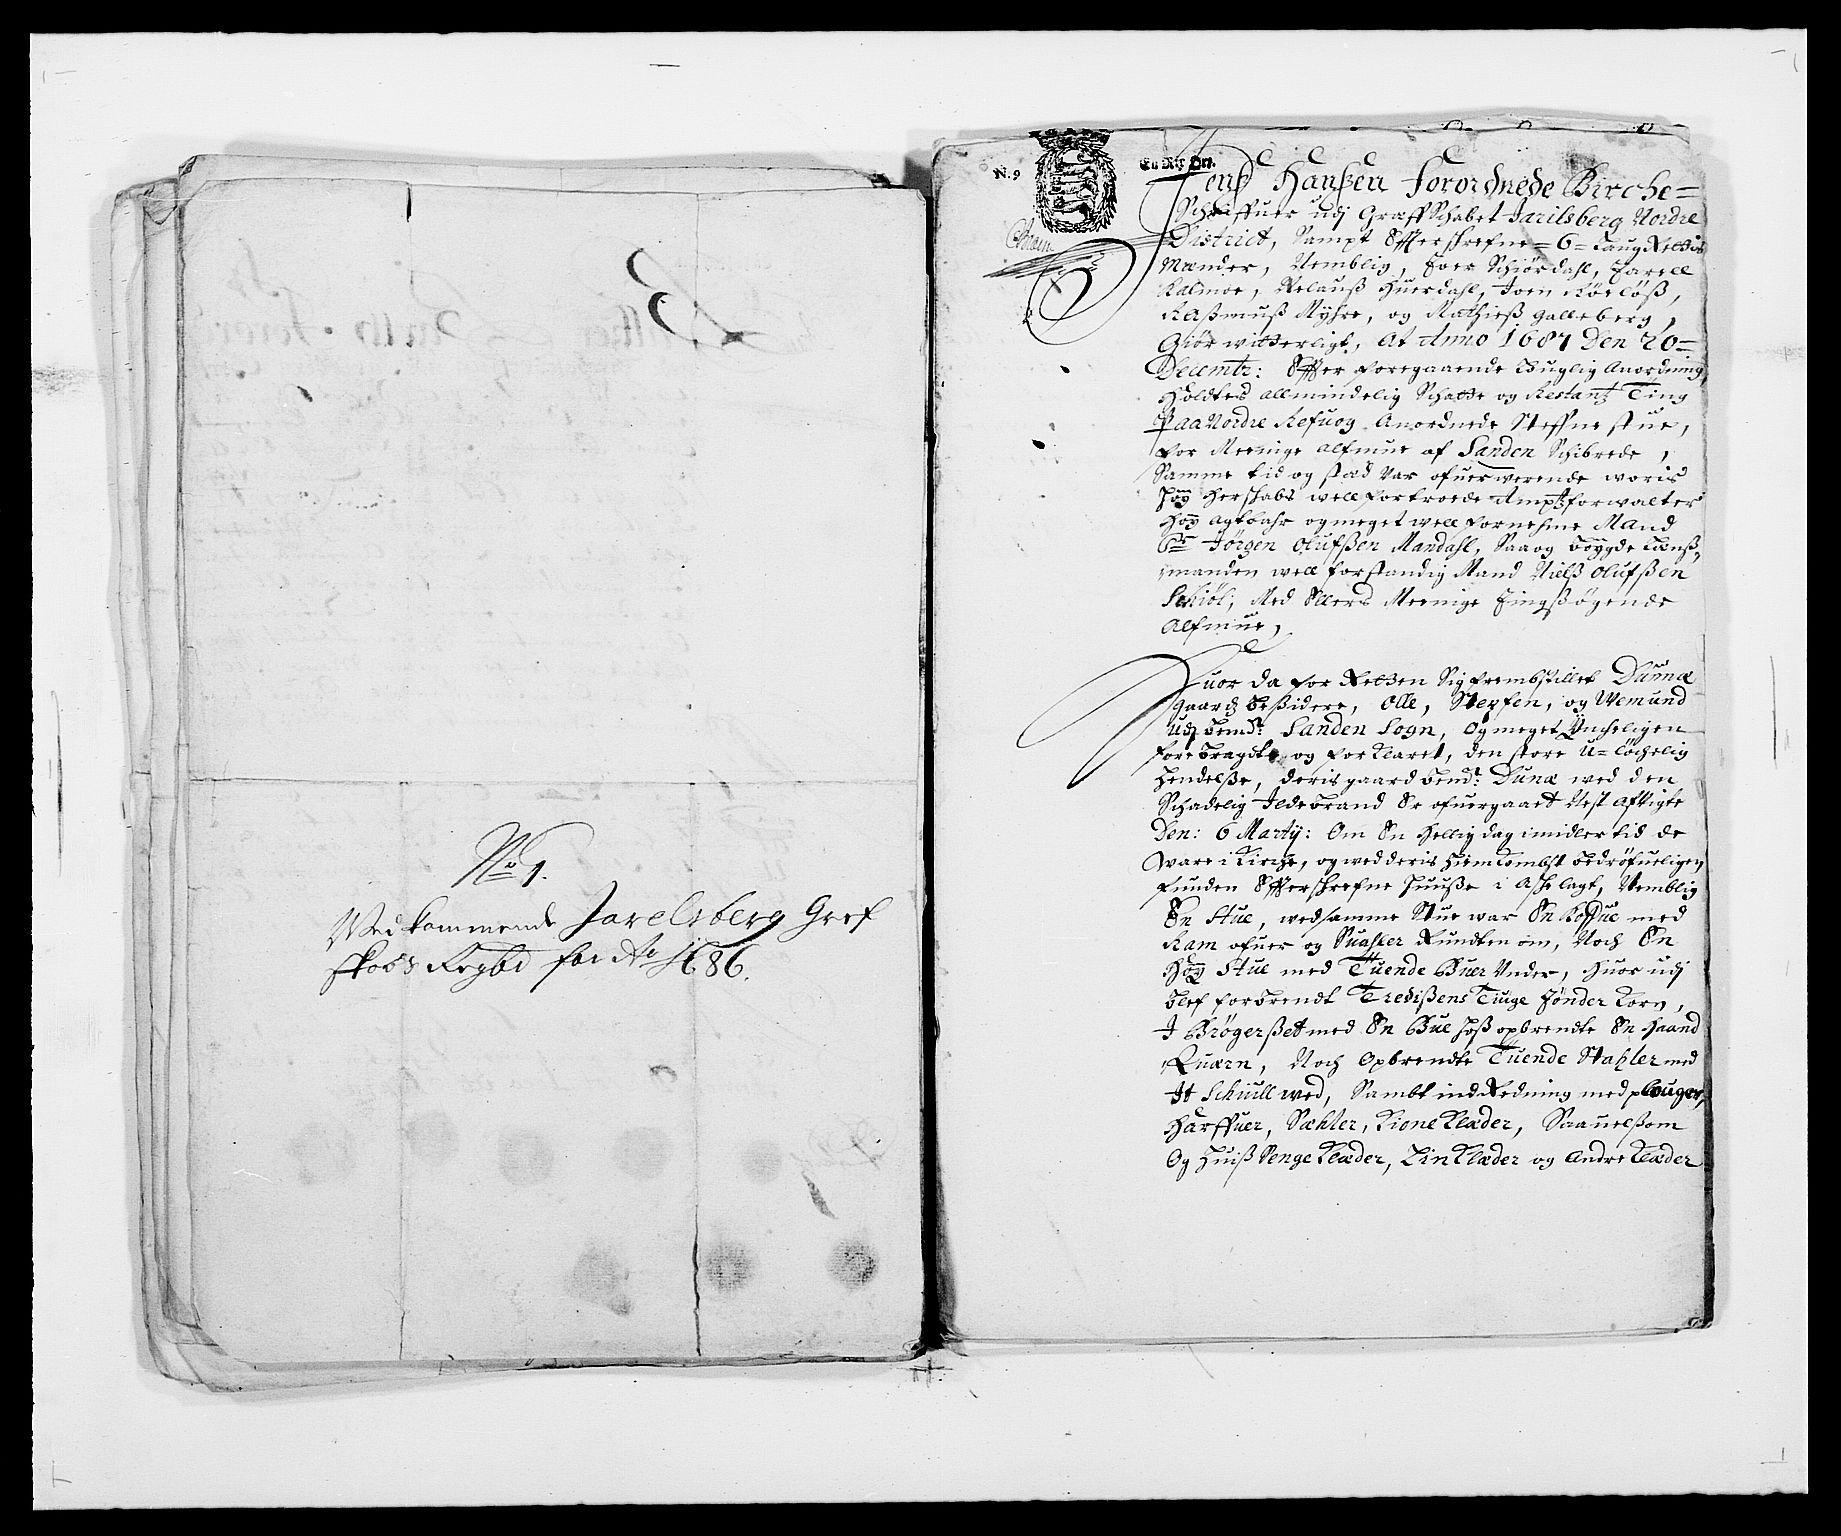 RA, Rentekammeret inntil 1814, Reviderte regnskaper, Fogderegnskap, R32/L1858: Fogderegnskap Jarlsberg grevskap, 1686-1690, s. 429